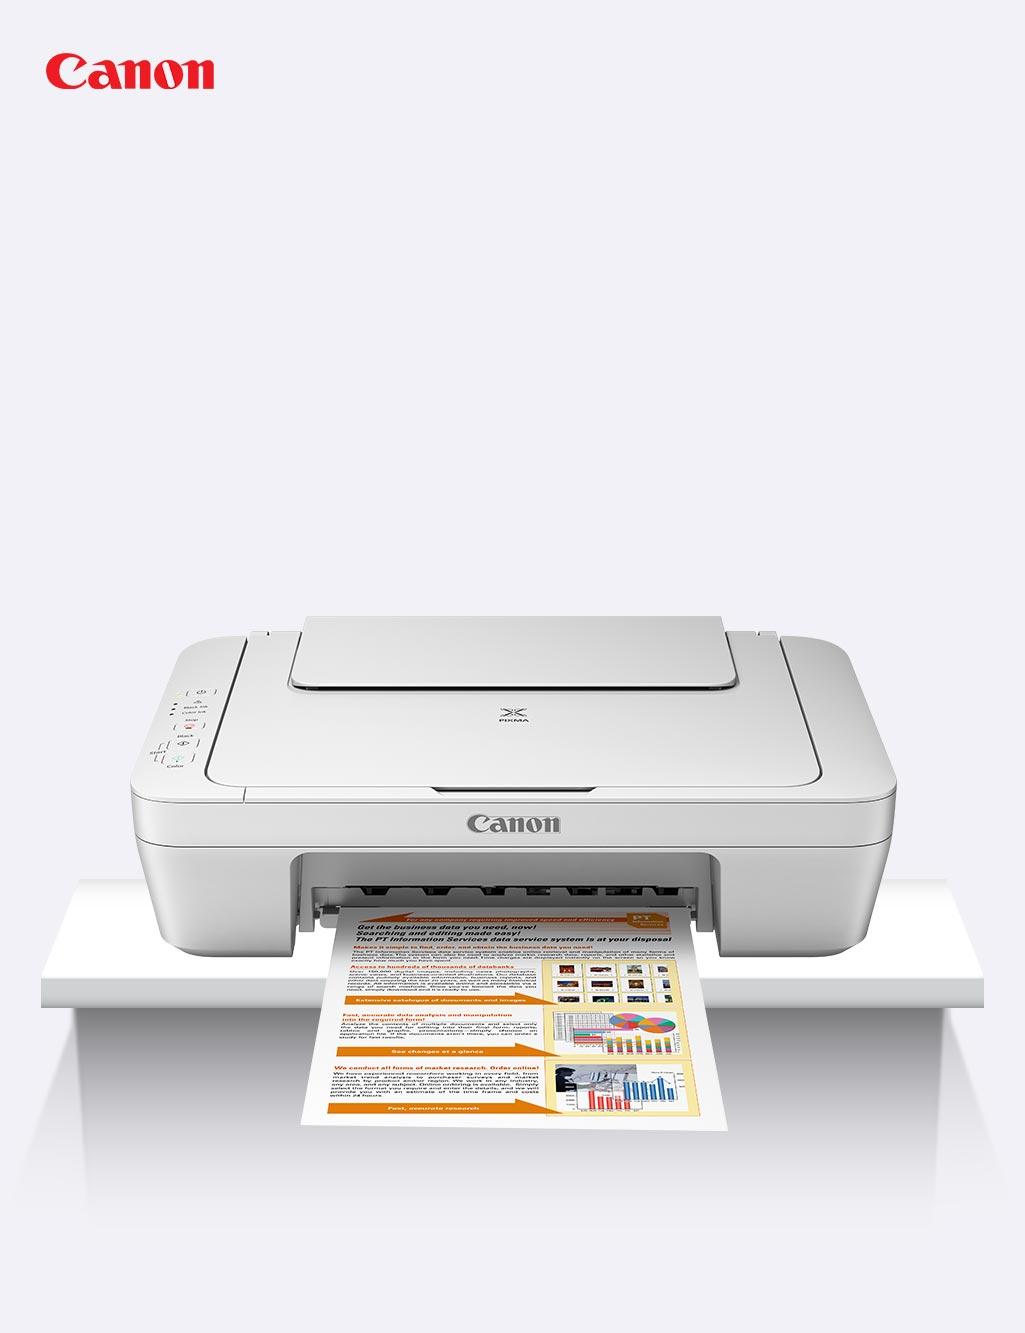 Canon 3 in 1 Color Printer, Copier & Scanner - Buy Online at Best